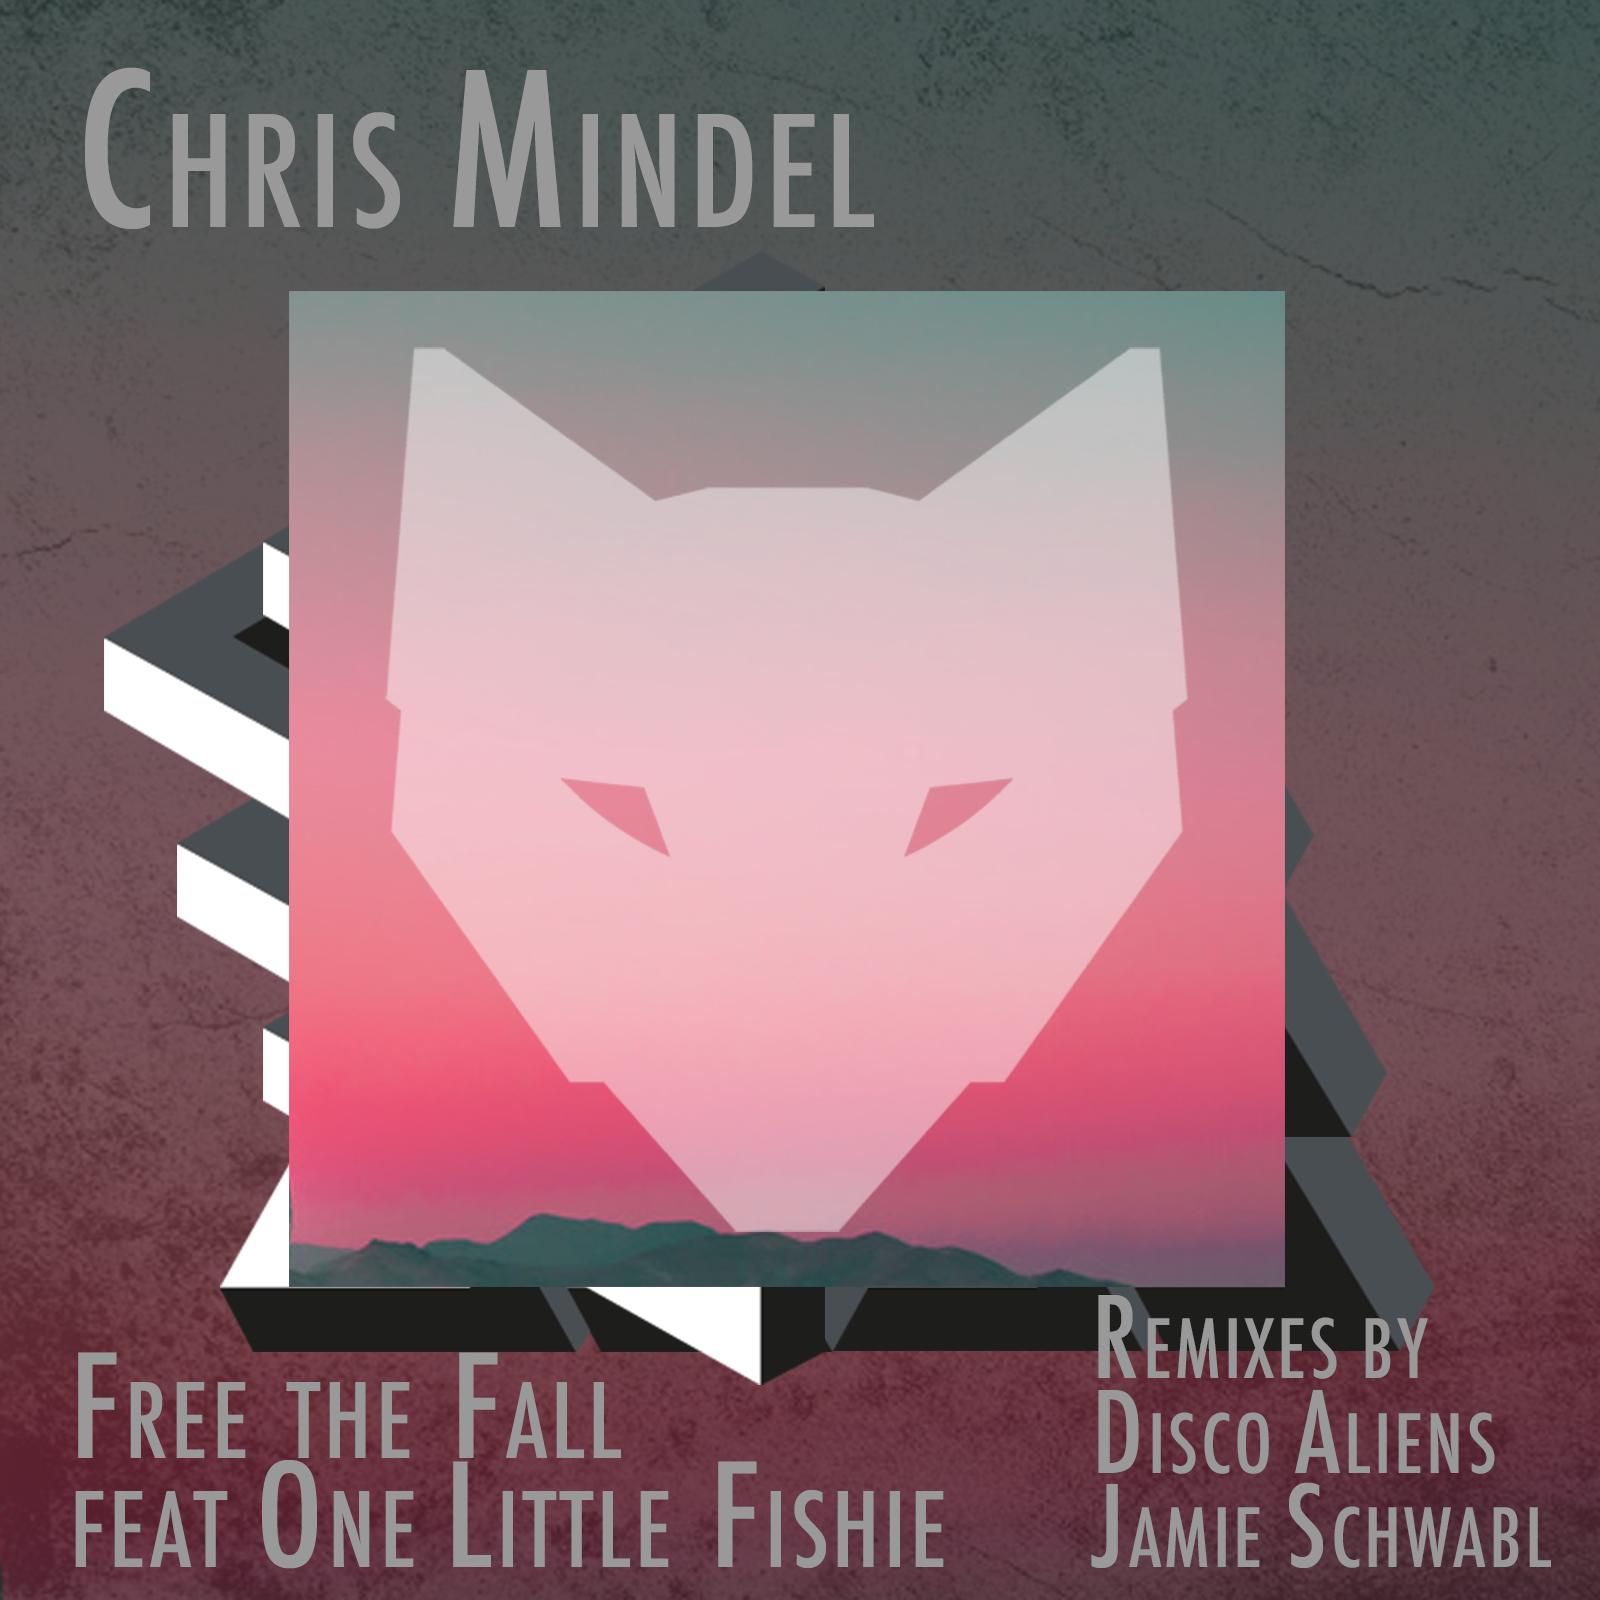 CHRIS-MINDLE-FREE-THE-FALL